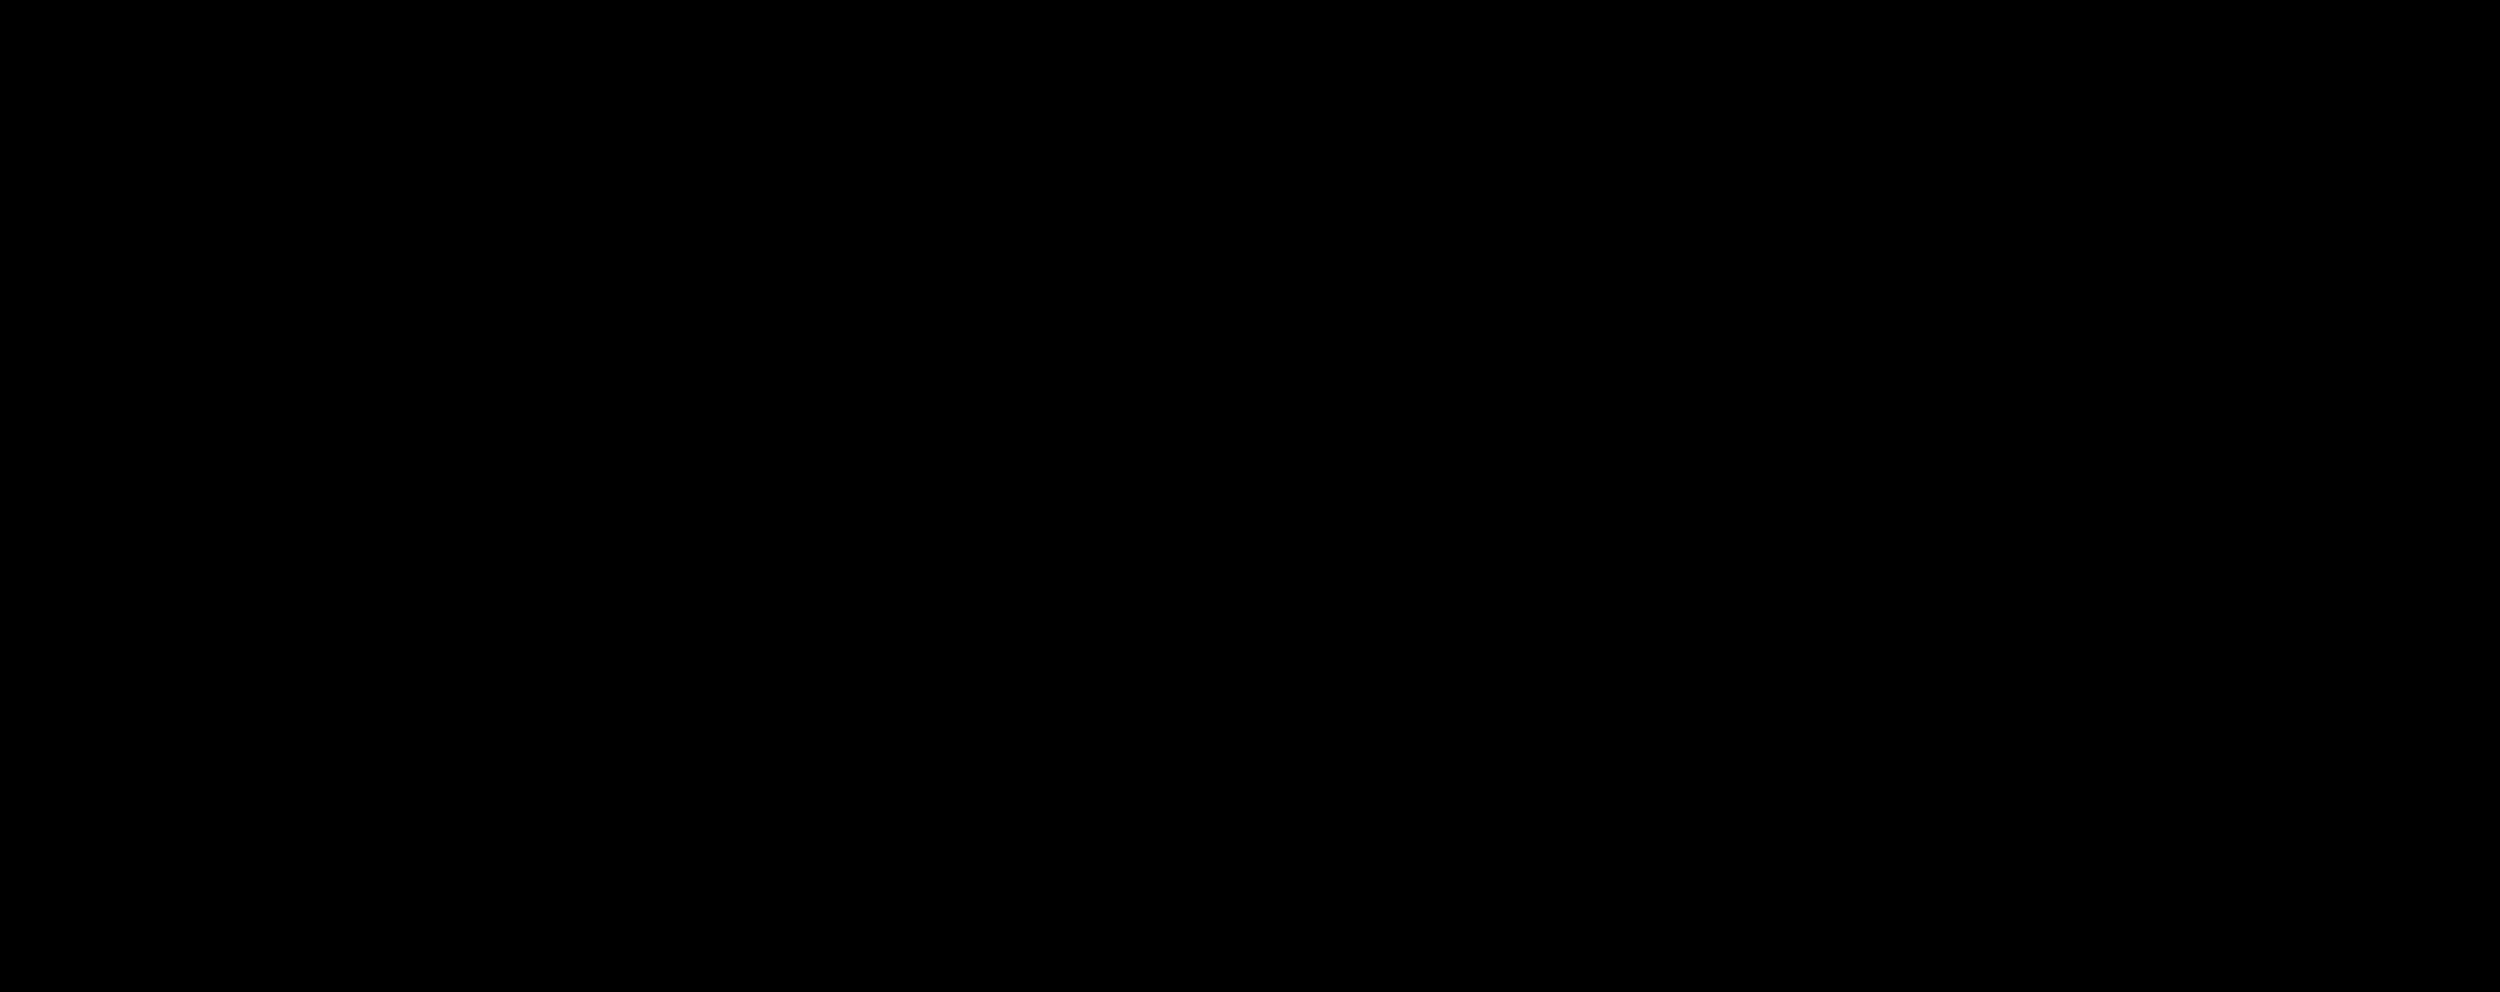 lolas_logo_black.png